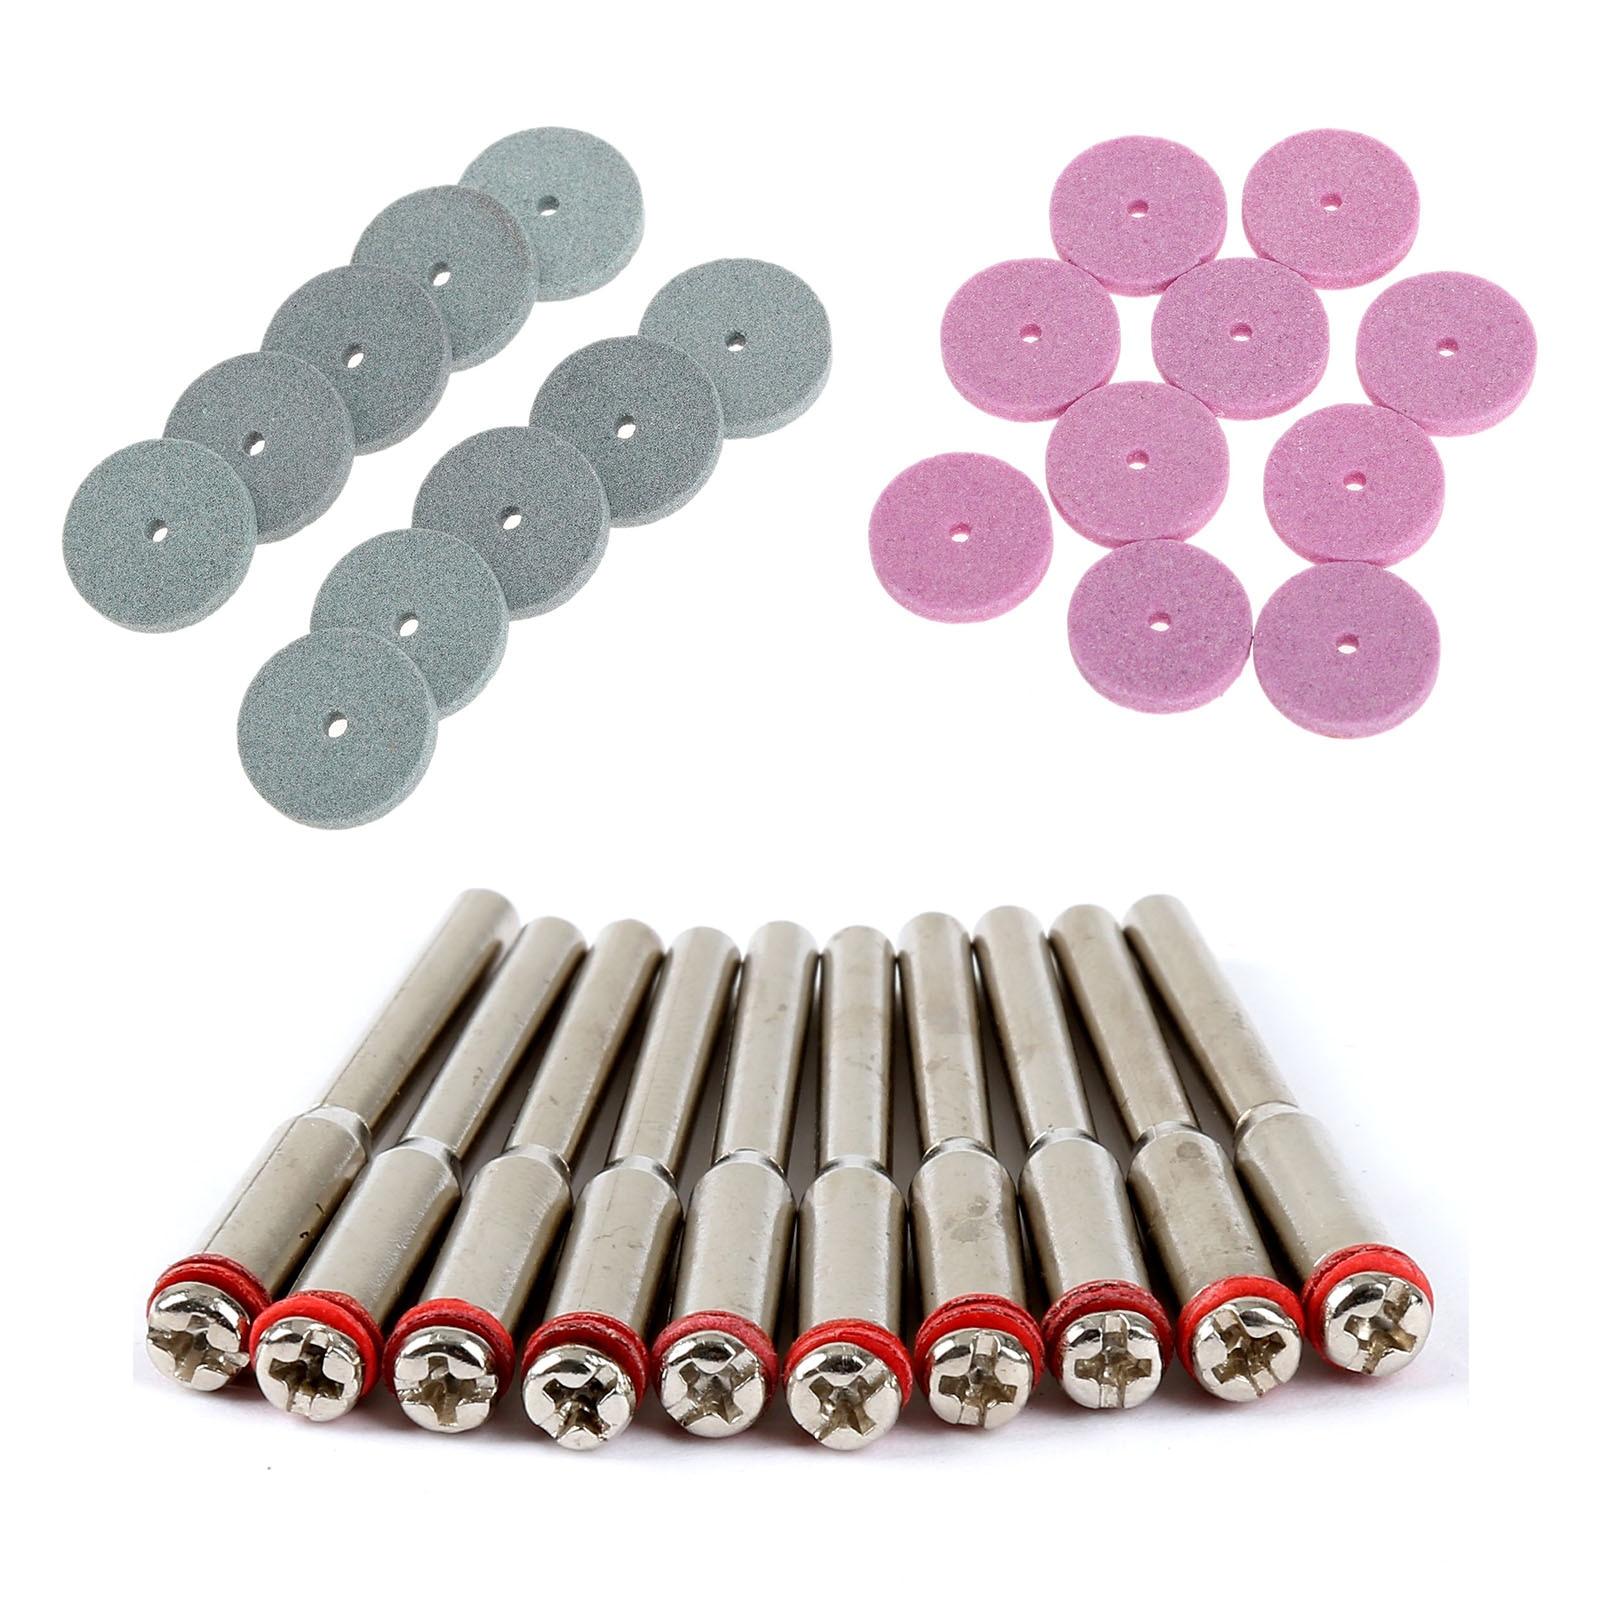 20Pcs Dremel Accessories 20mm Mini Drill Grinding Wheel/Buffing Wheel Polishing Pad Disc For Rotary Tools +10Pcs 3.175mm Mandrel